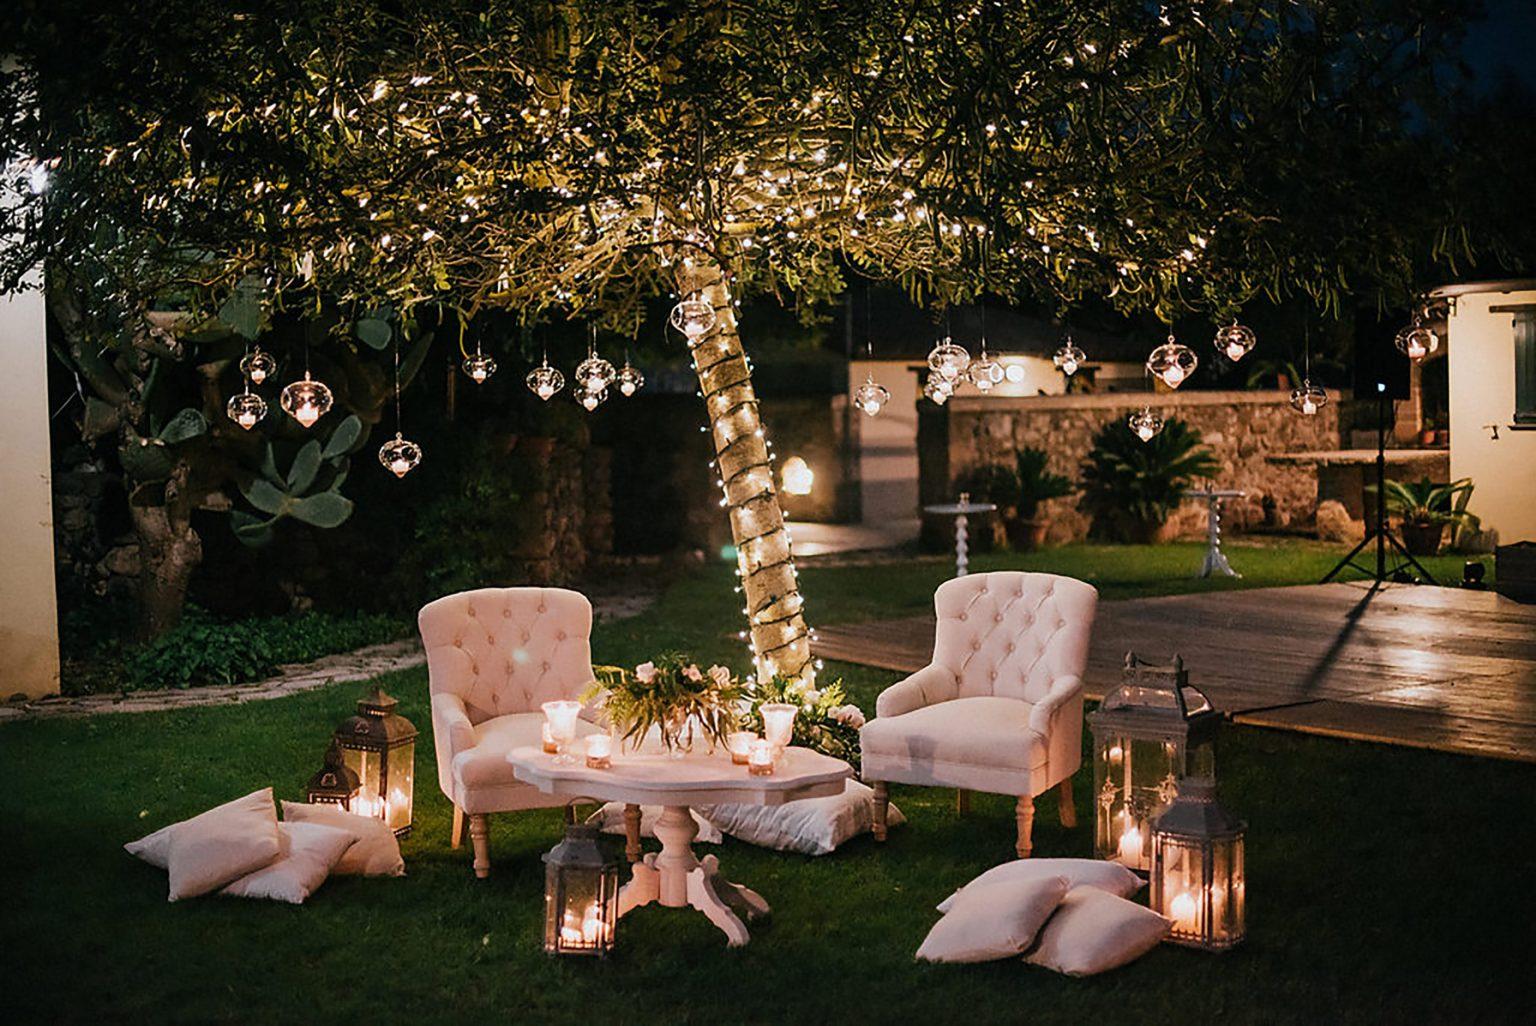 Ilaria e Giovanni, chic wedding lounge area